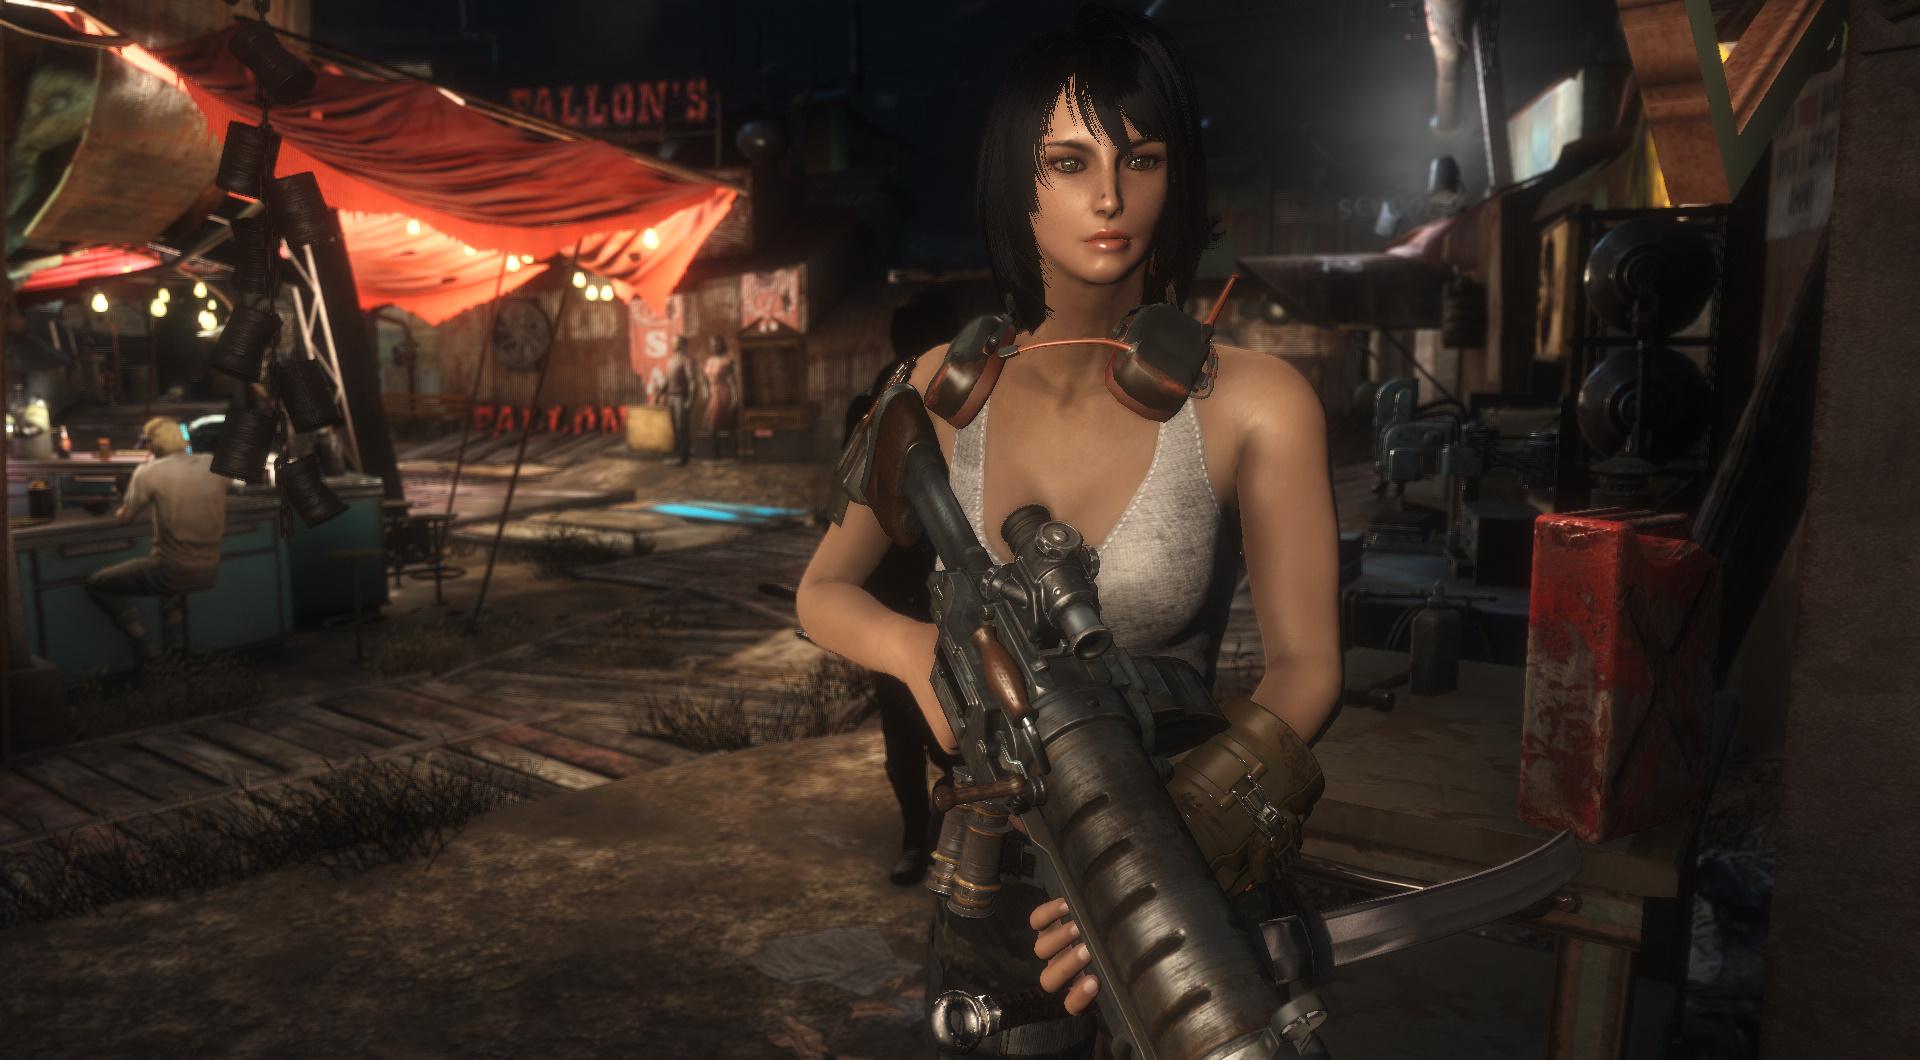 Fallout4 2017-11-24 20-54-13-610